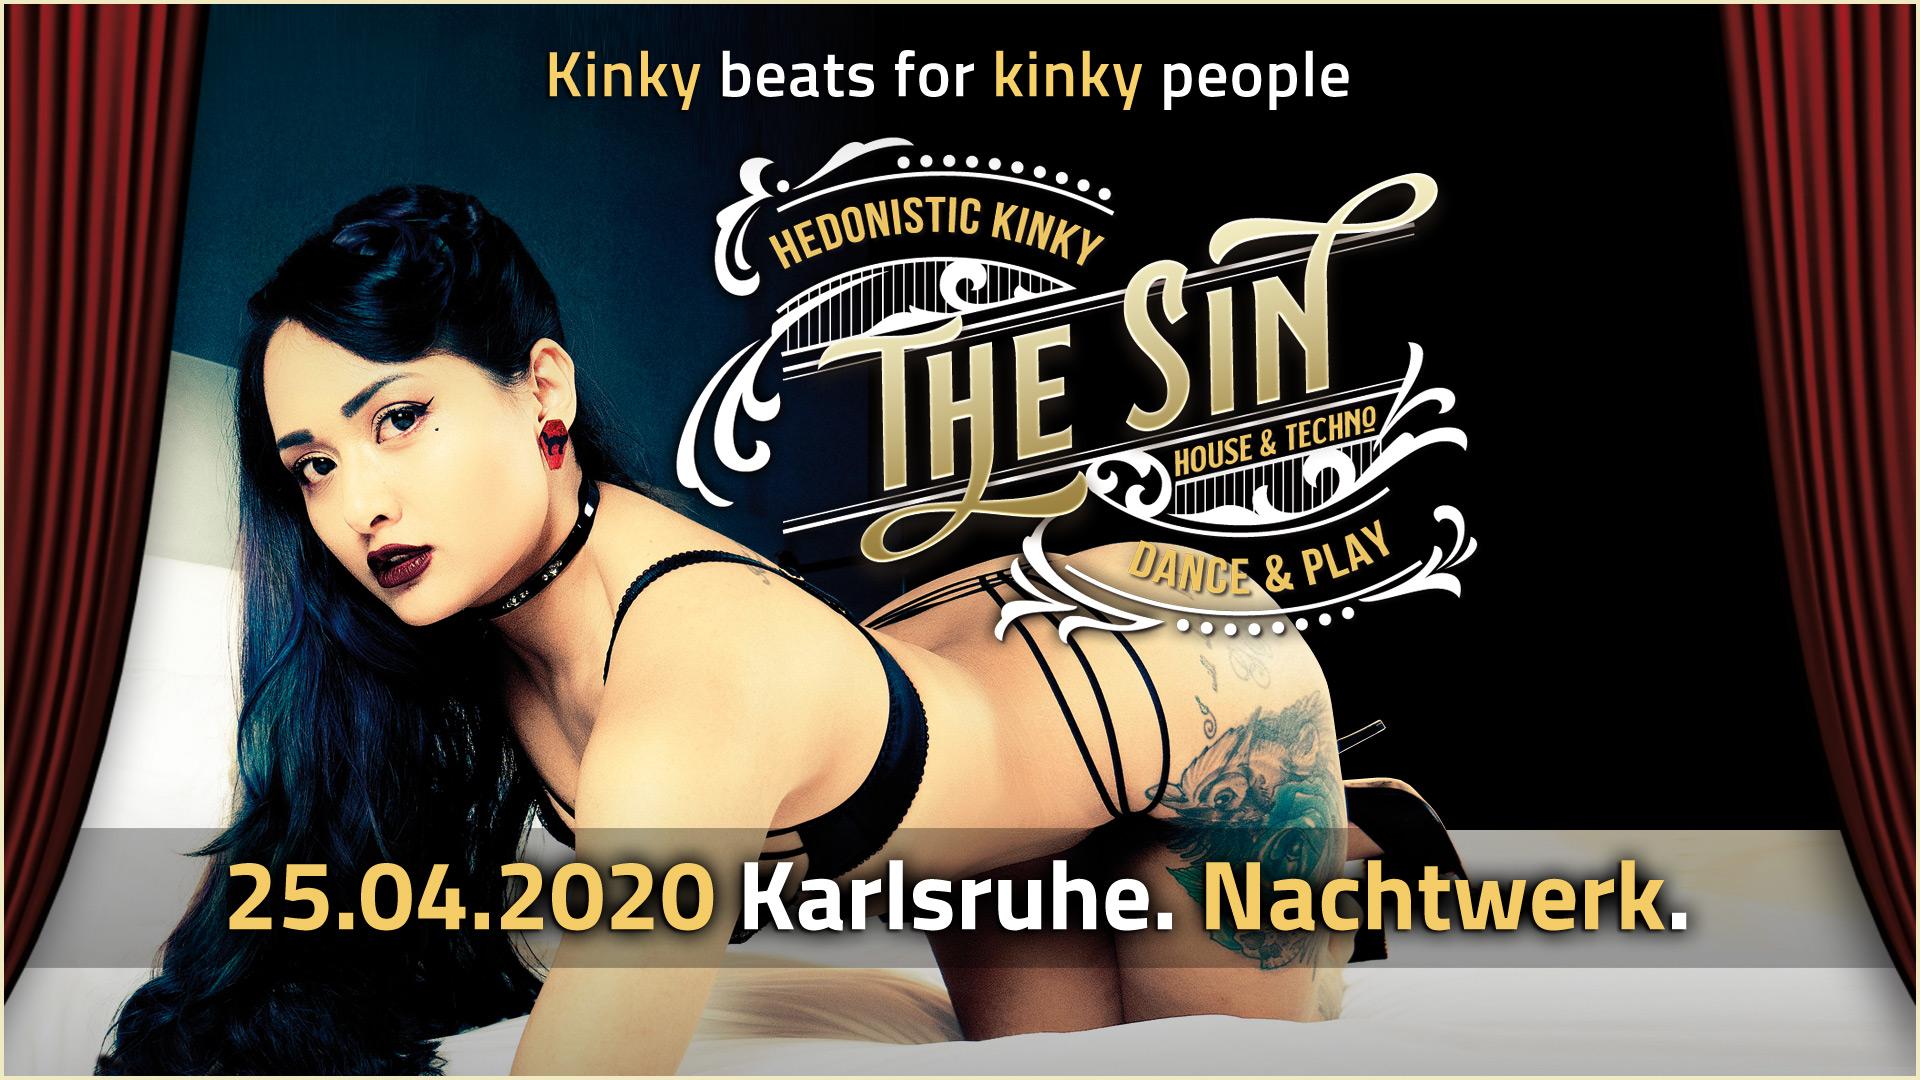 THE SIN » Kinky House & Techno Dance & Play-Party